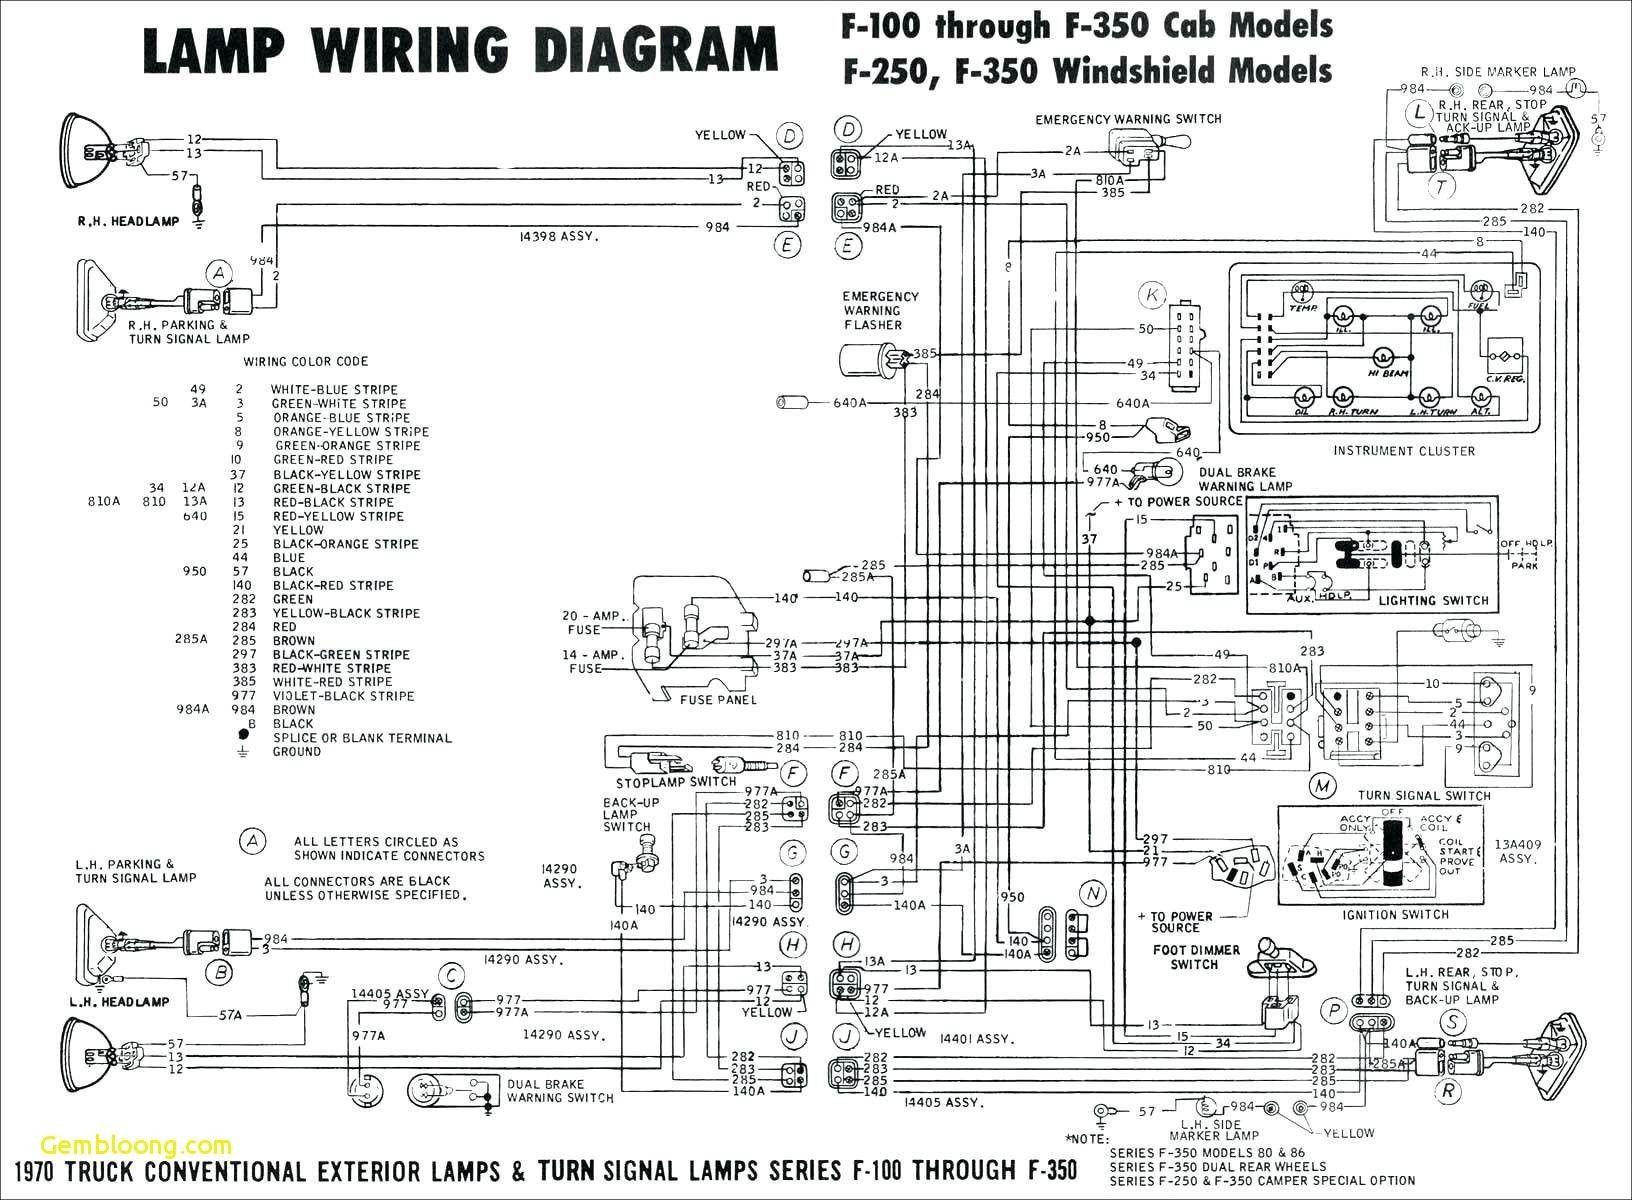 Light Switch Wiring Super M Tractor Honda Accord Nissan Maxima Honda Civic